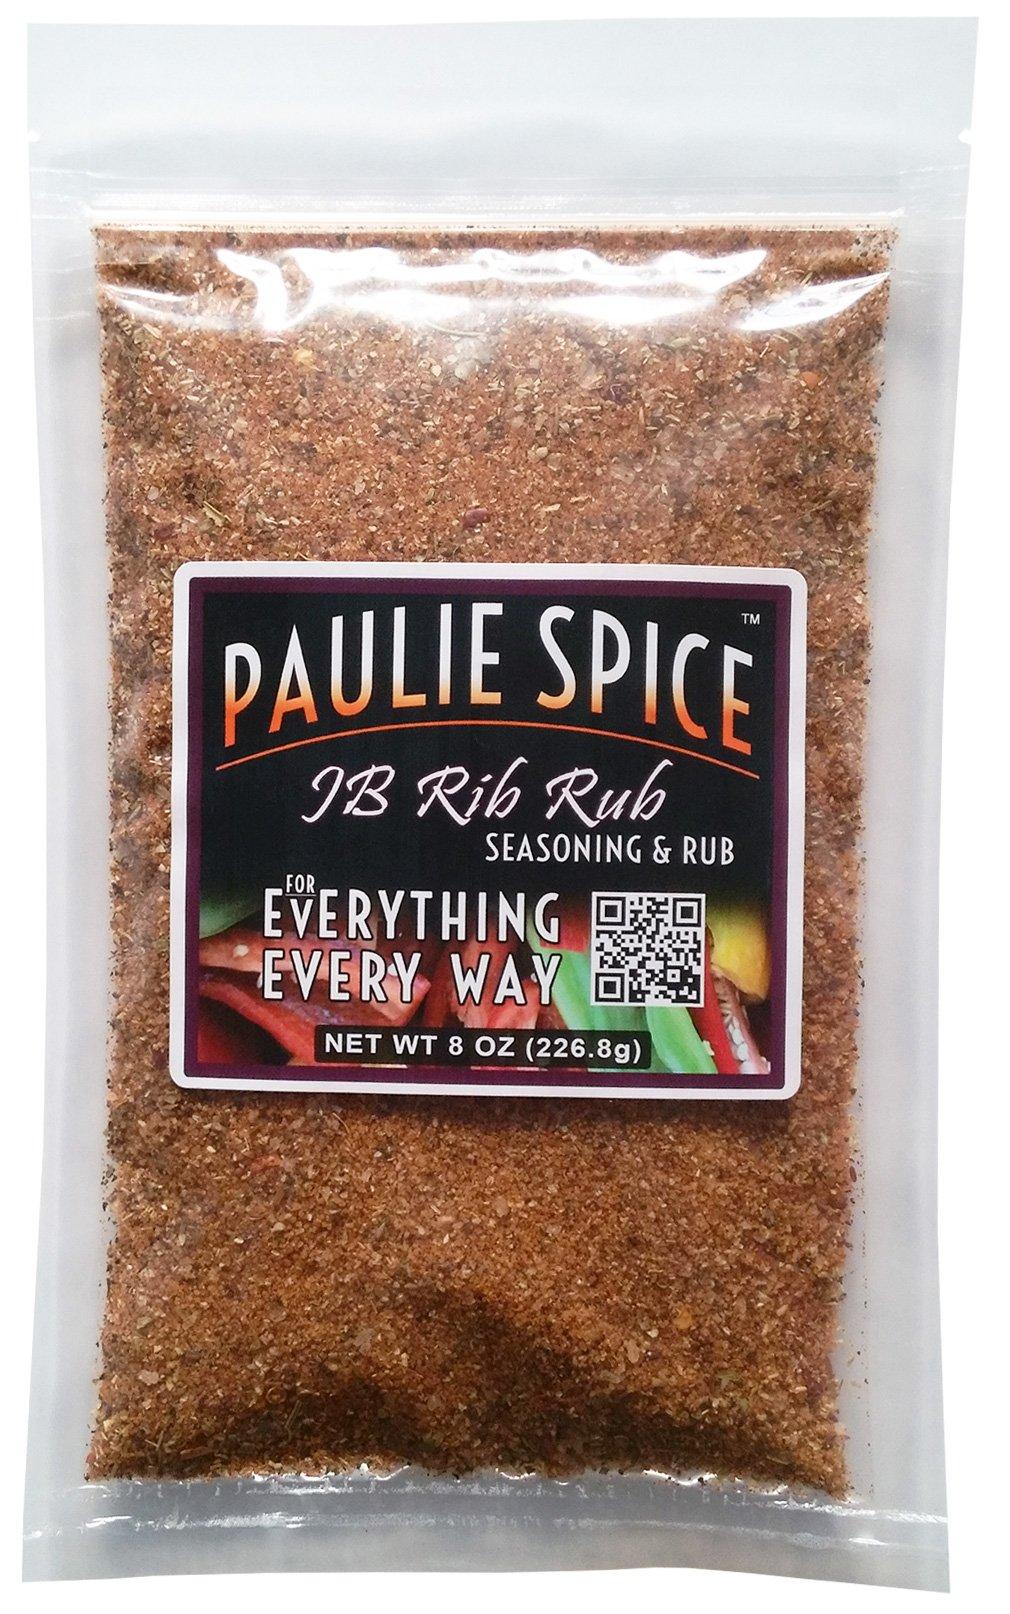 Paulie Spice : JB Rib Rub Sweet & Smoky Barbecue Seasoning : 8 oz by Paulie Spice